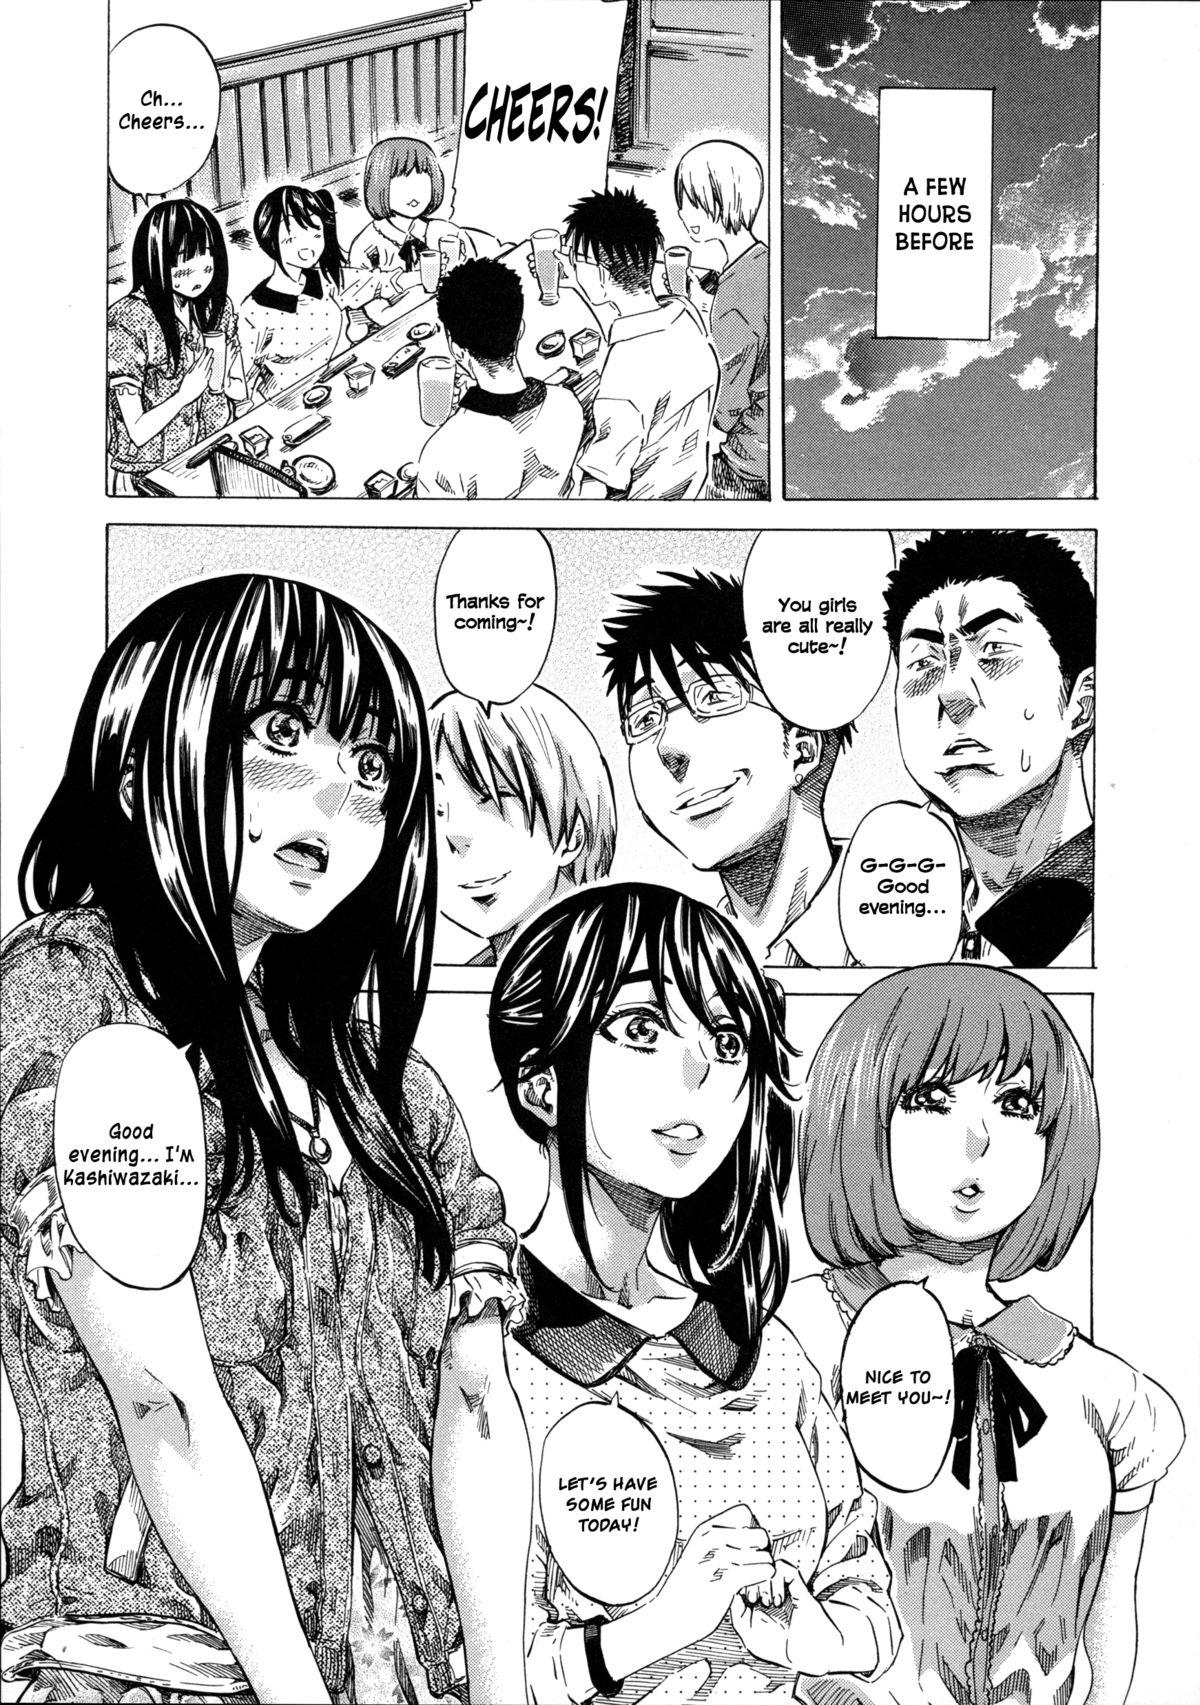 Kashiwazaki Miki wa Ironna Basho de Zenra Sanpo Shitemita   Miki Kashiwazaki Goes Naked in All Sorts of Places Ch. 1-4 71